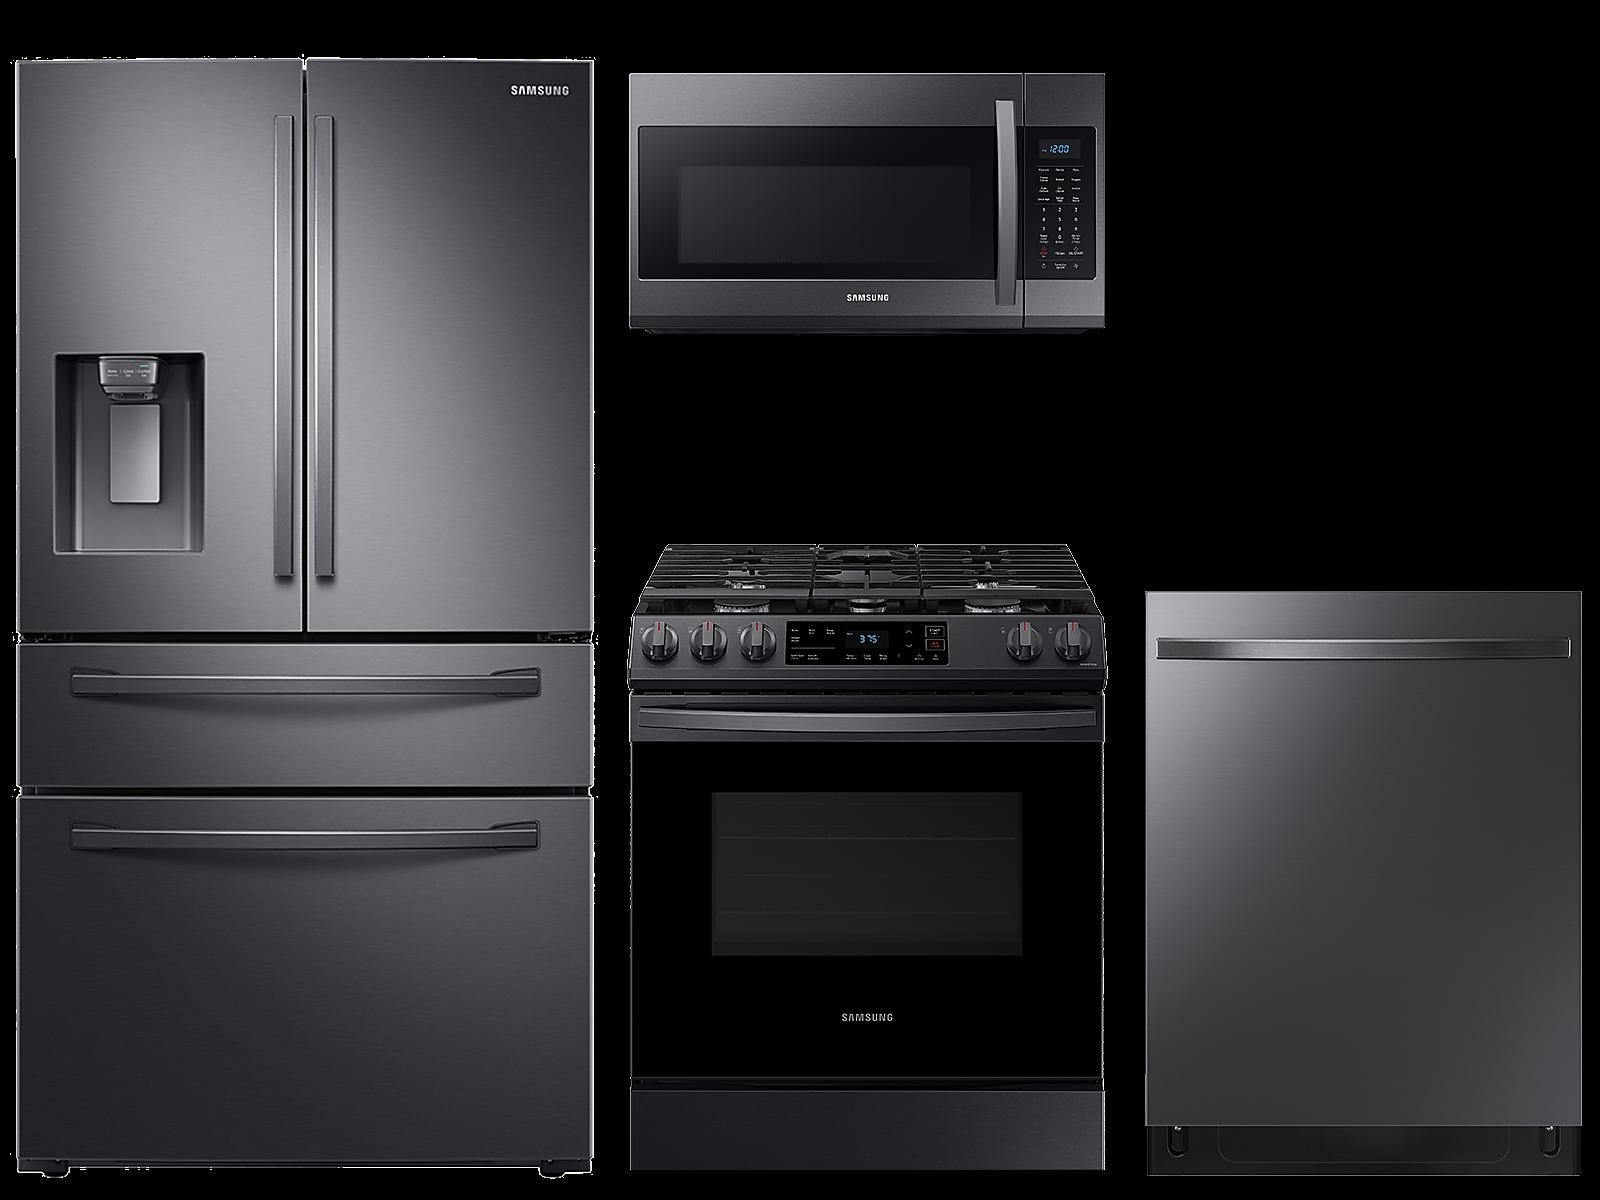 Samsung coupon: Samsung 28 cu. ft. 4-door refrigerator, gas range, microwave and 48 dBA modern-look dishwasher package(BNDL-1614026727646)